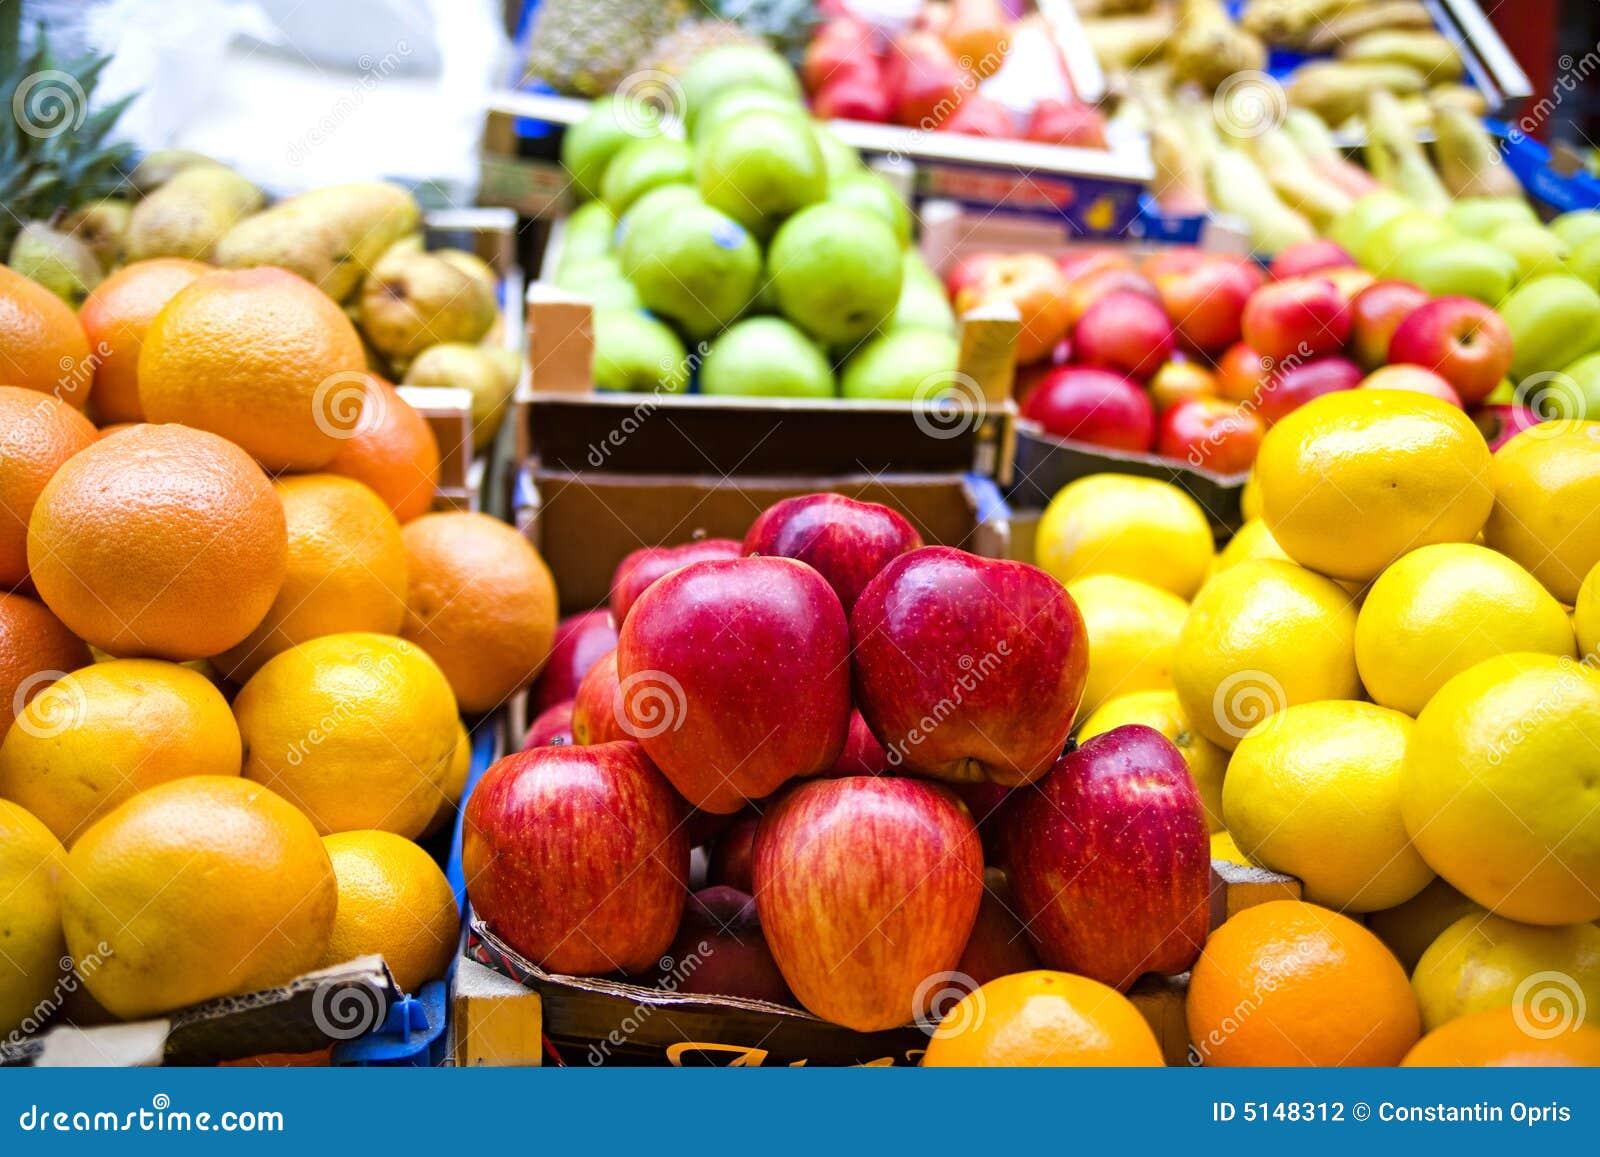 Fruchtmarkt